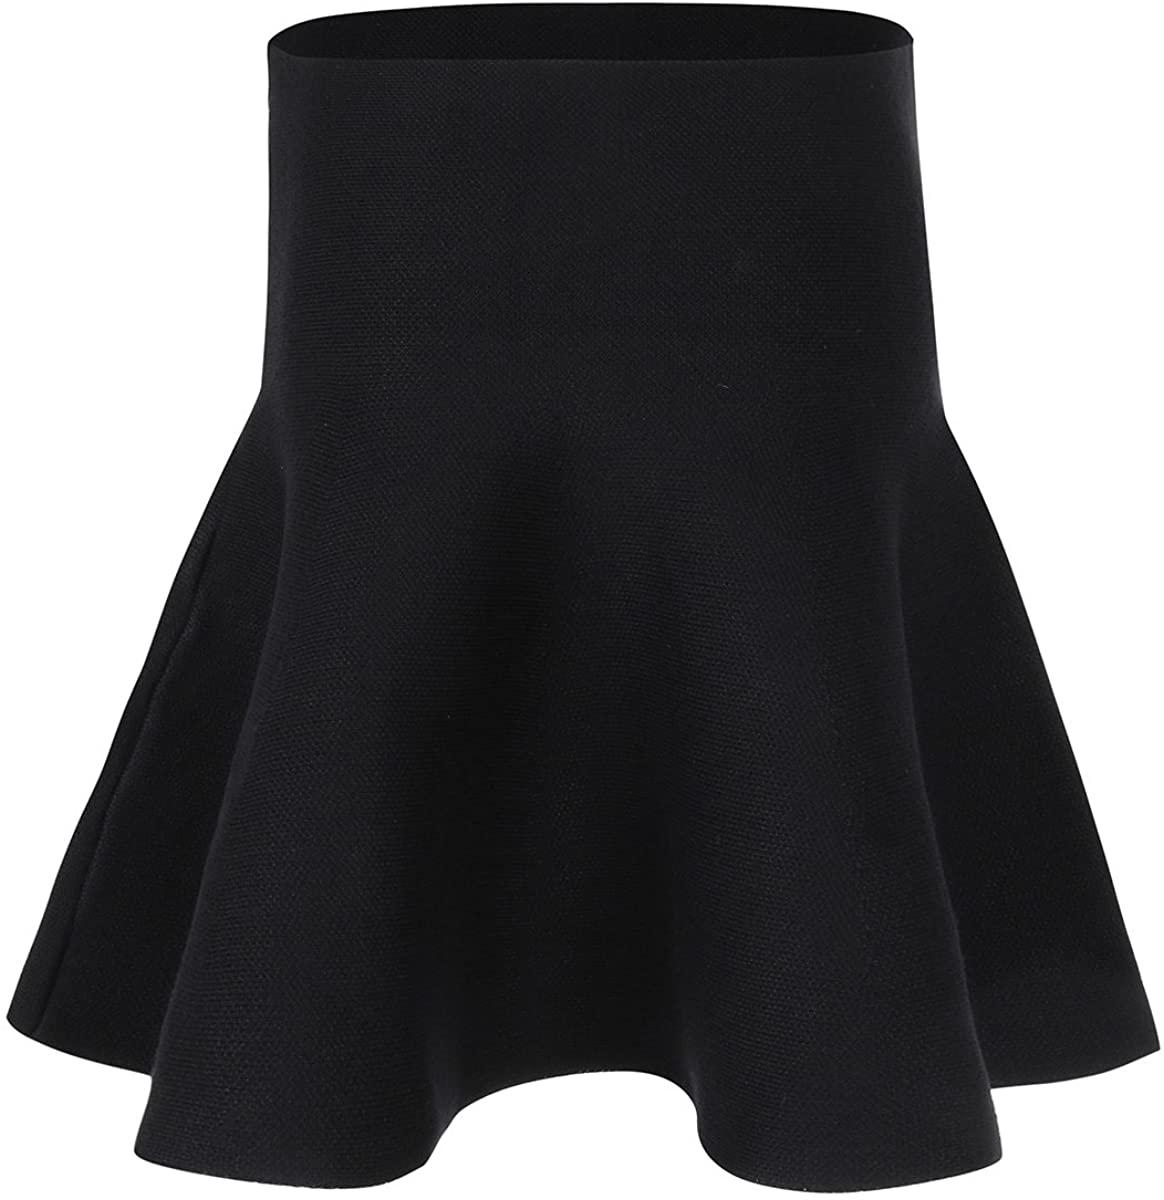 iiniim Kid Girls Knitted Flared Plaid Skater Tartan Skirt High Waist A Line Pleated Summer School Uniform Mini Daily Skirt Black 4-5